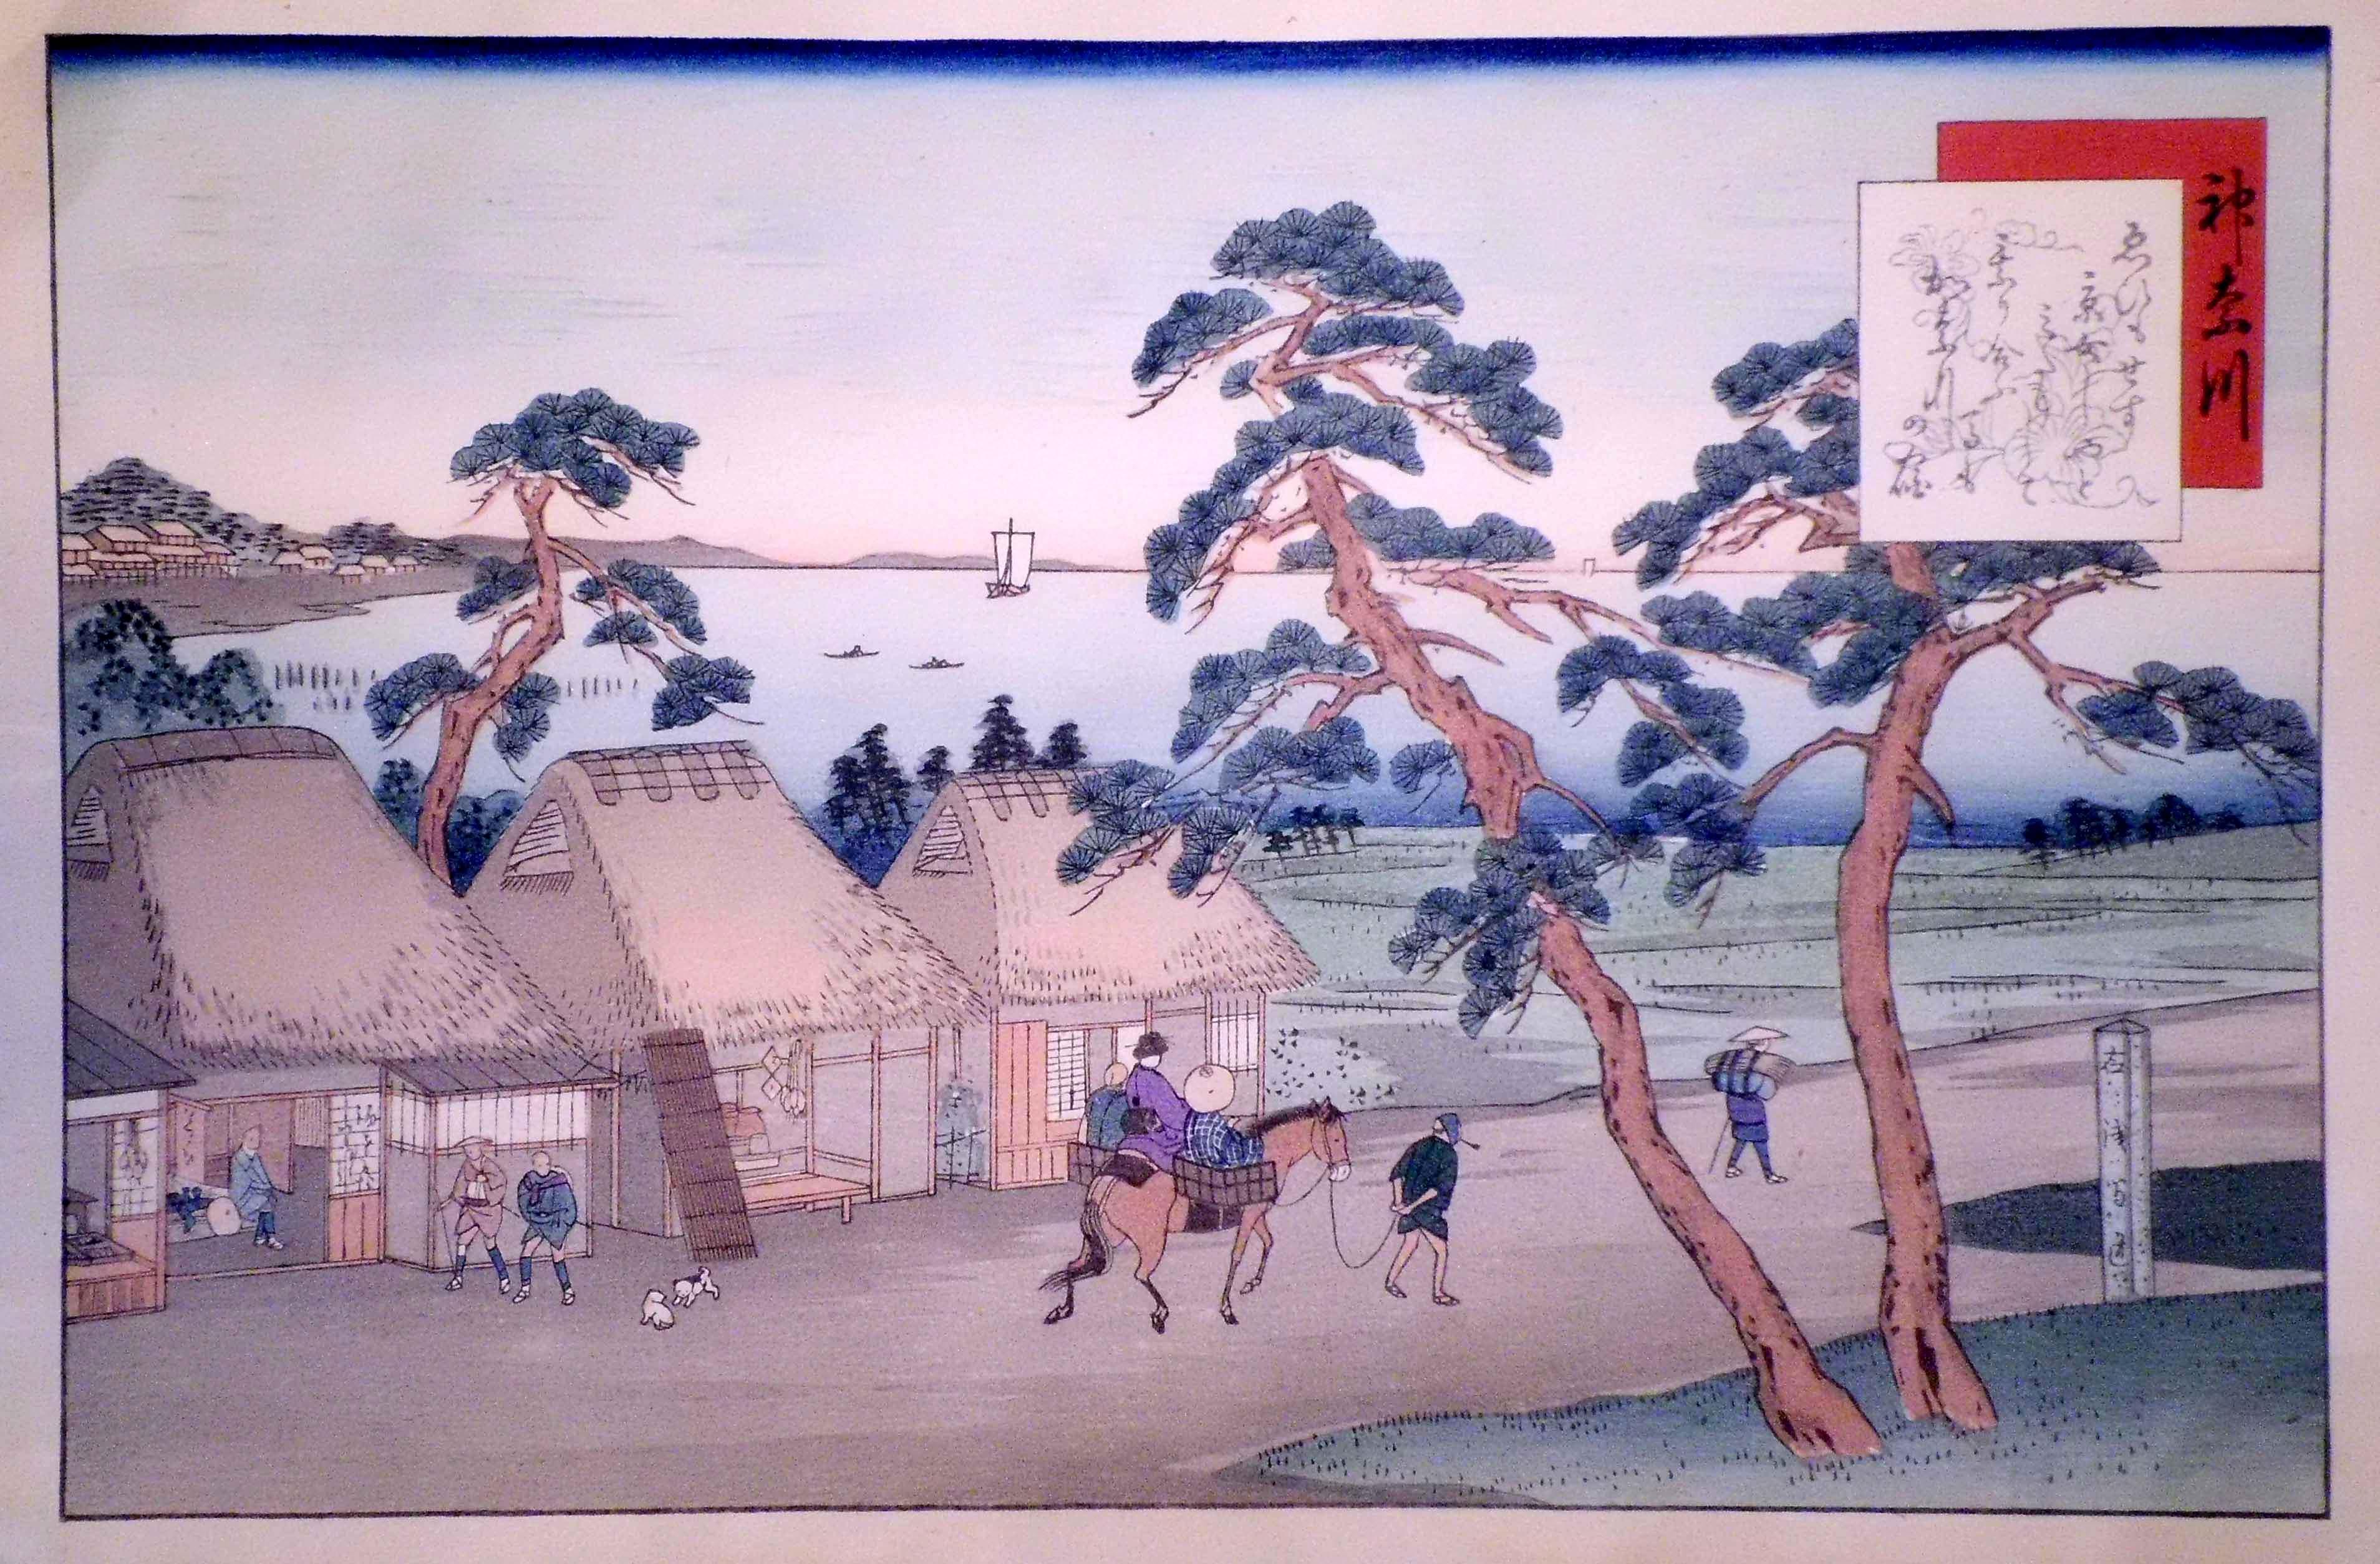 Fujikawa TAMENOBU (attivo nel 1890/1914) – KANAGAWA, TERZA STAZIONE DELLA TOKAIDO